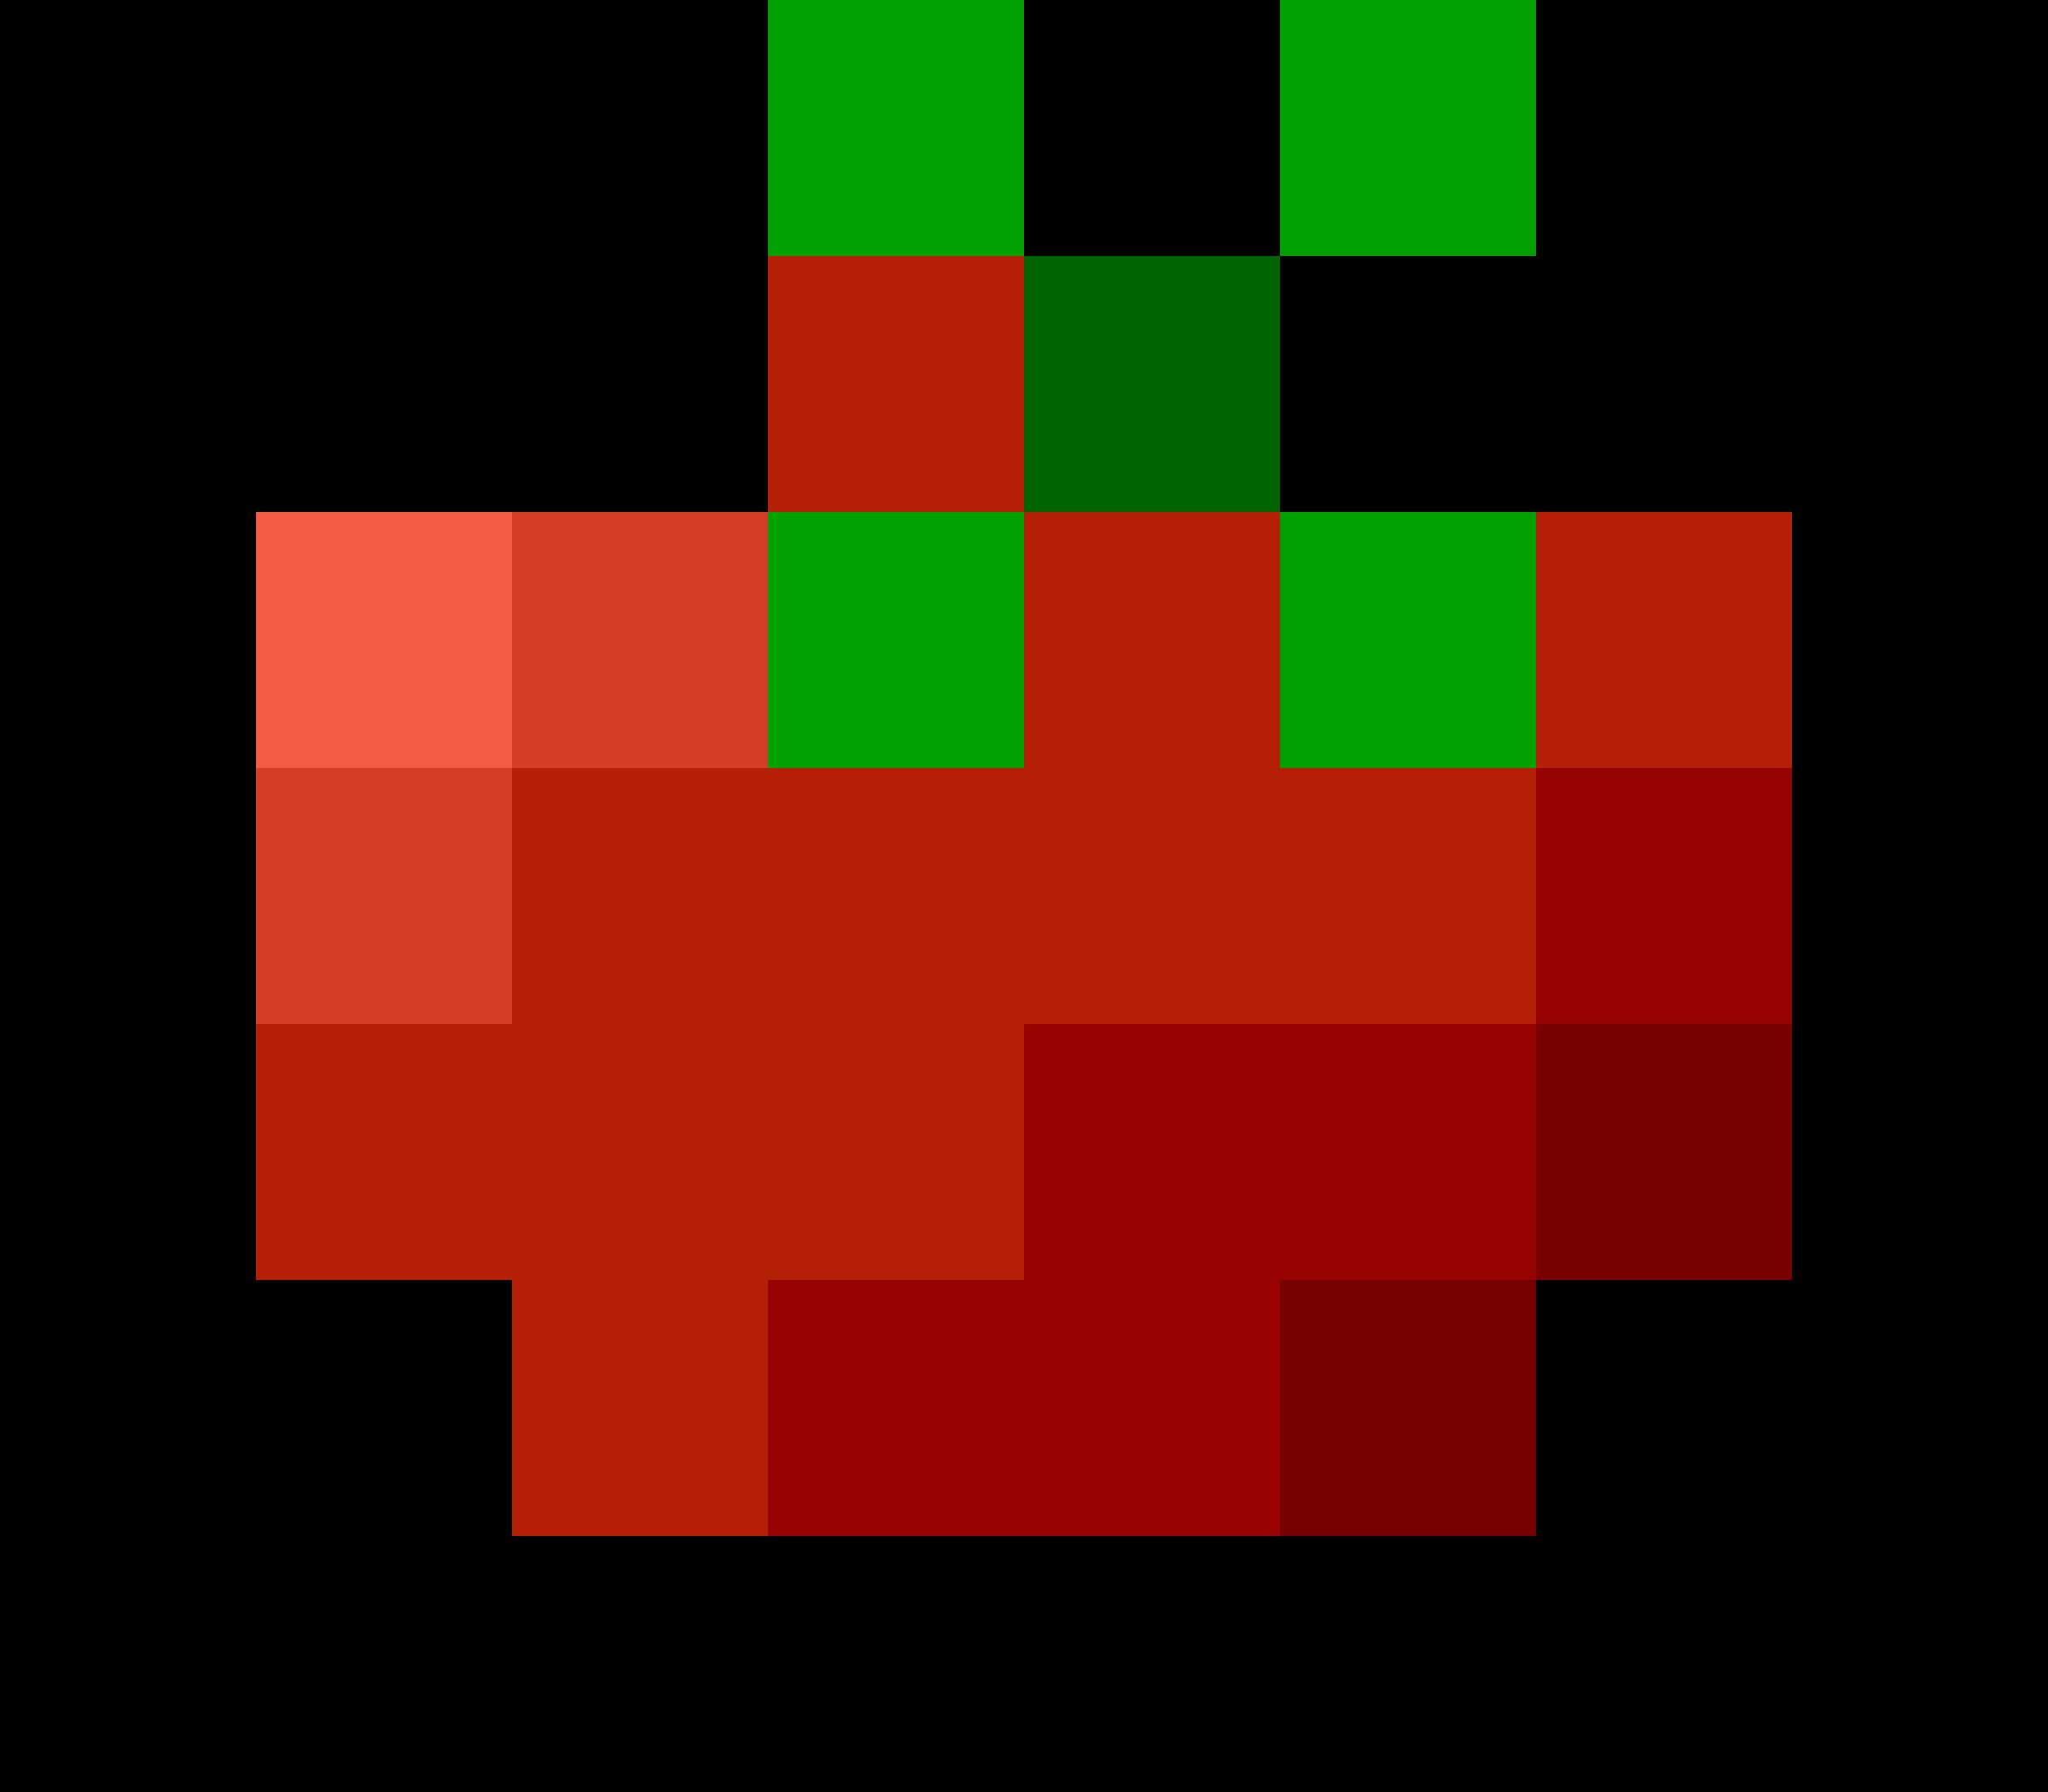 Logs clipart pixel. Tomato big image png